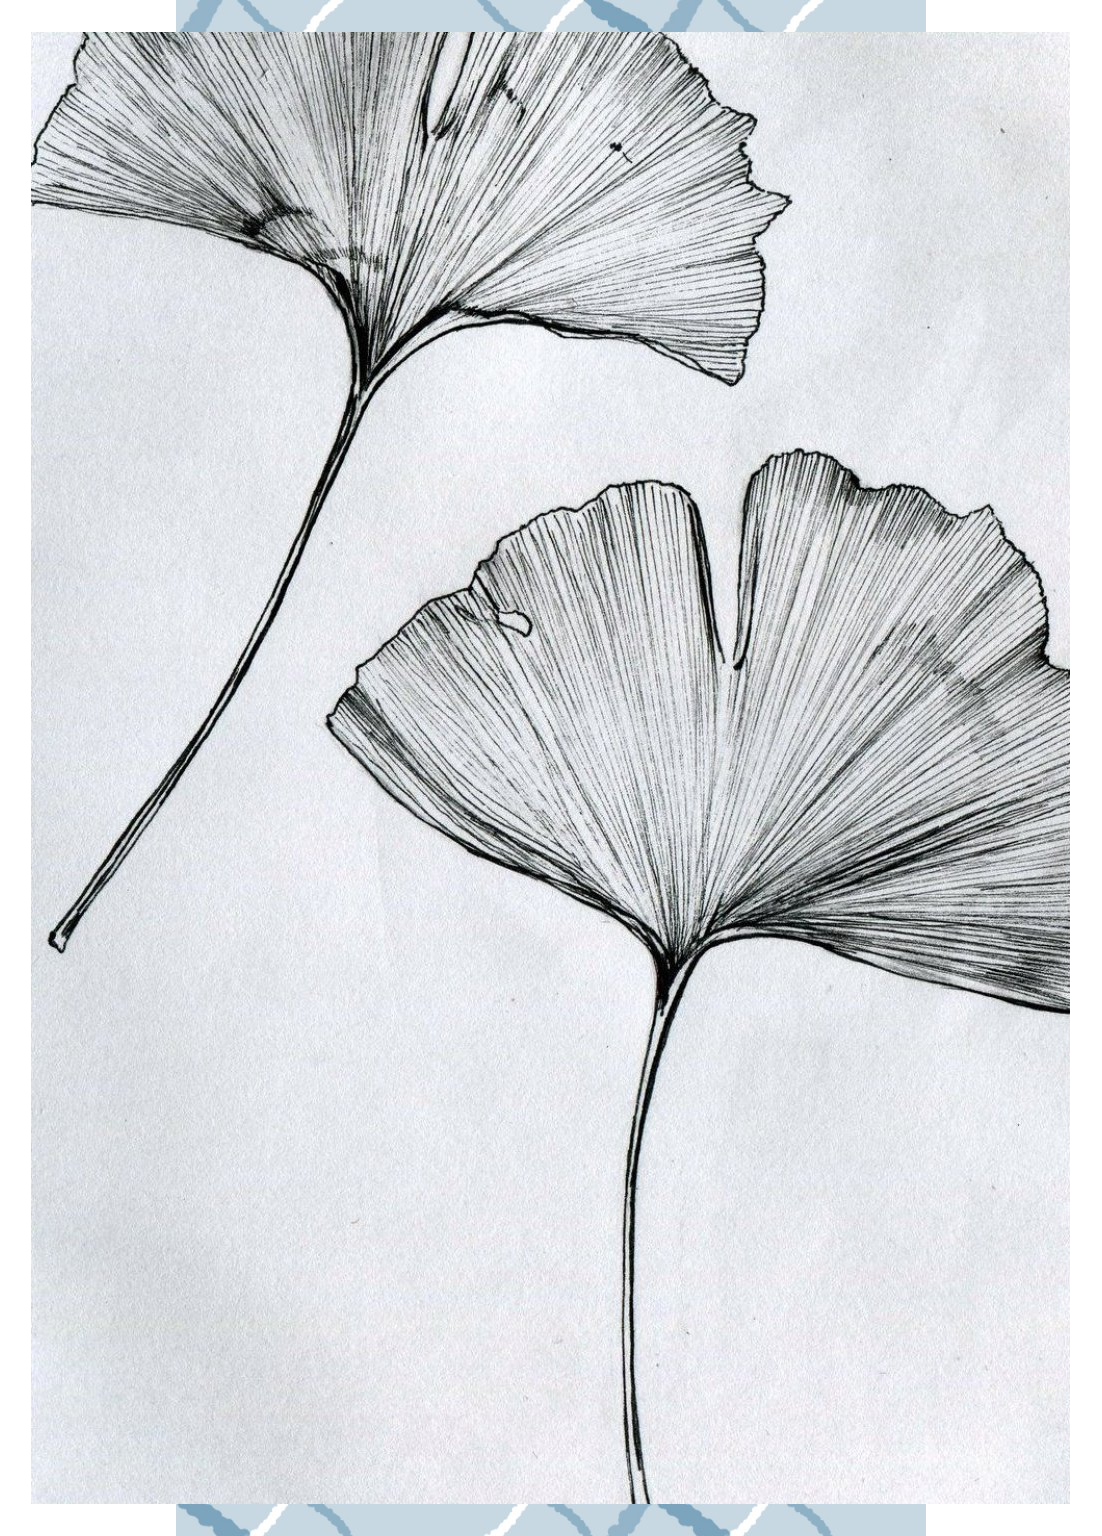 Millicent Crow Gingko Leaf Drawing Leaf Art Japanese Tattoo Designs